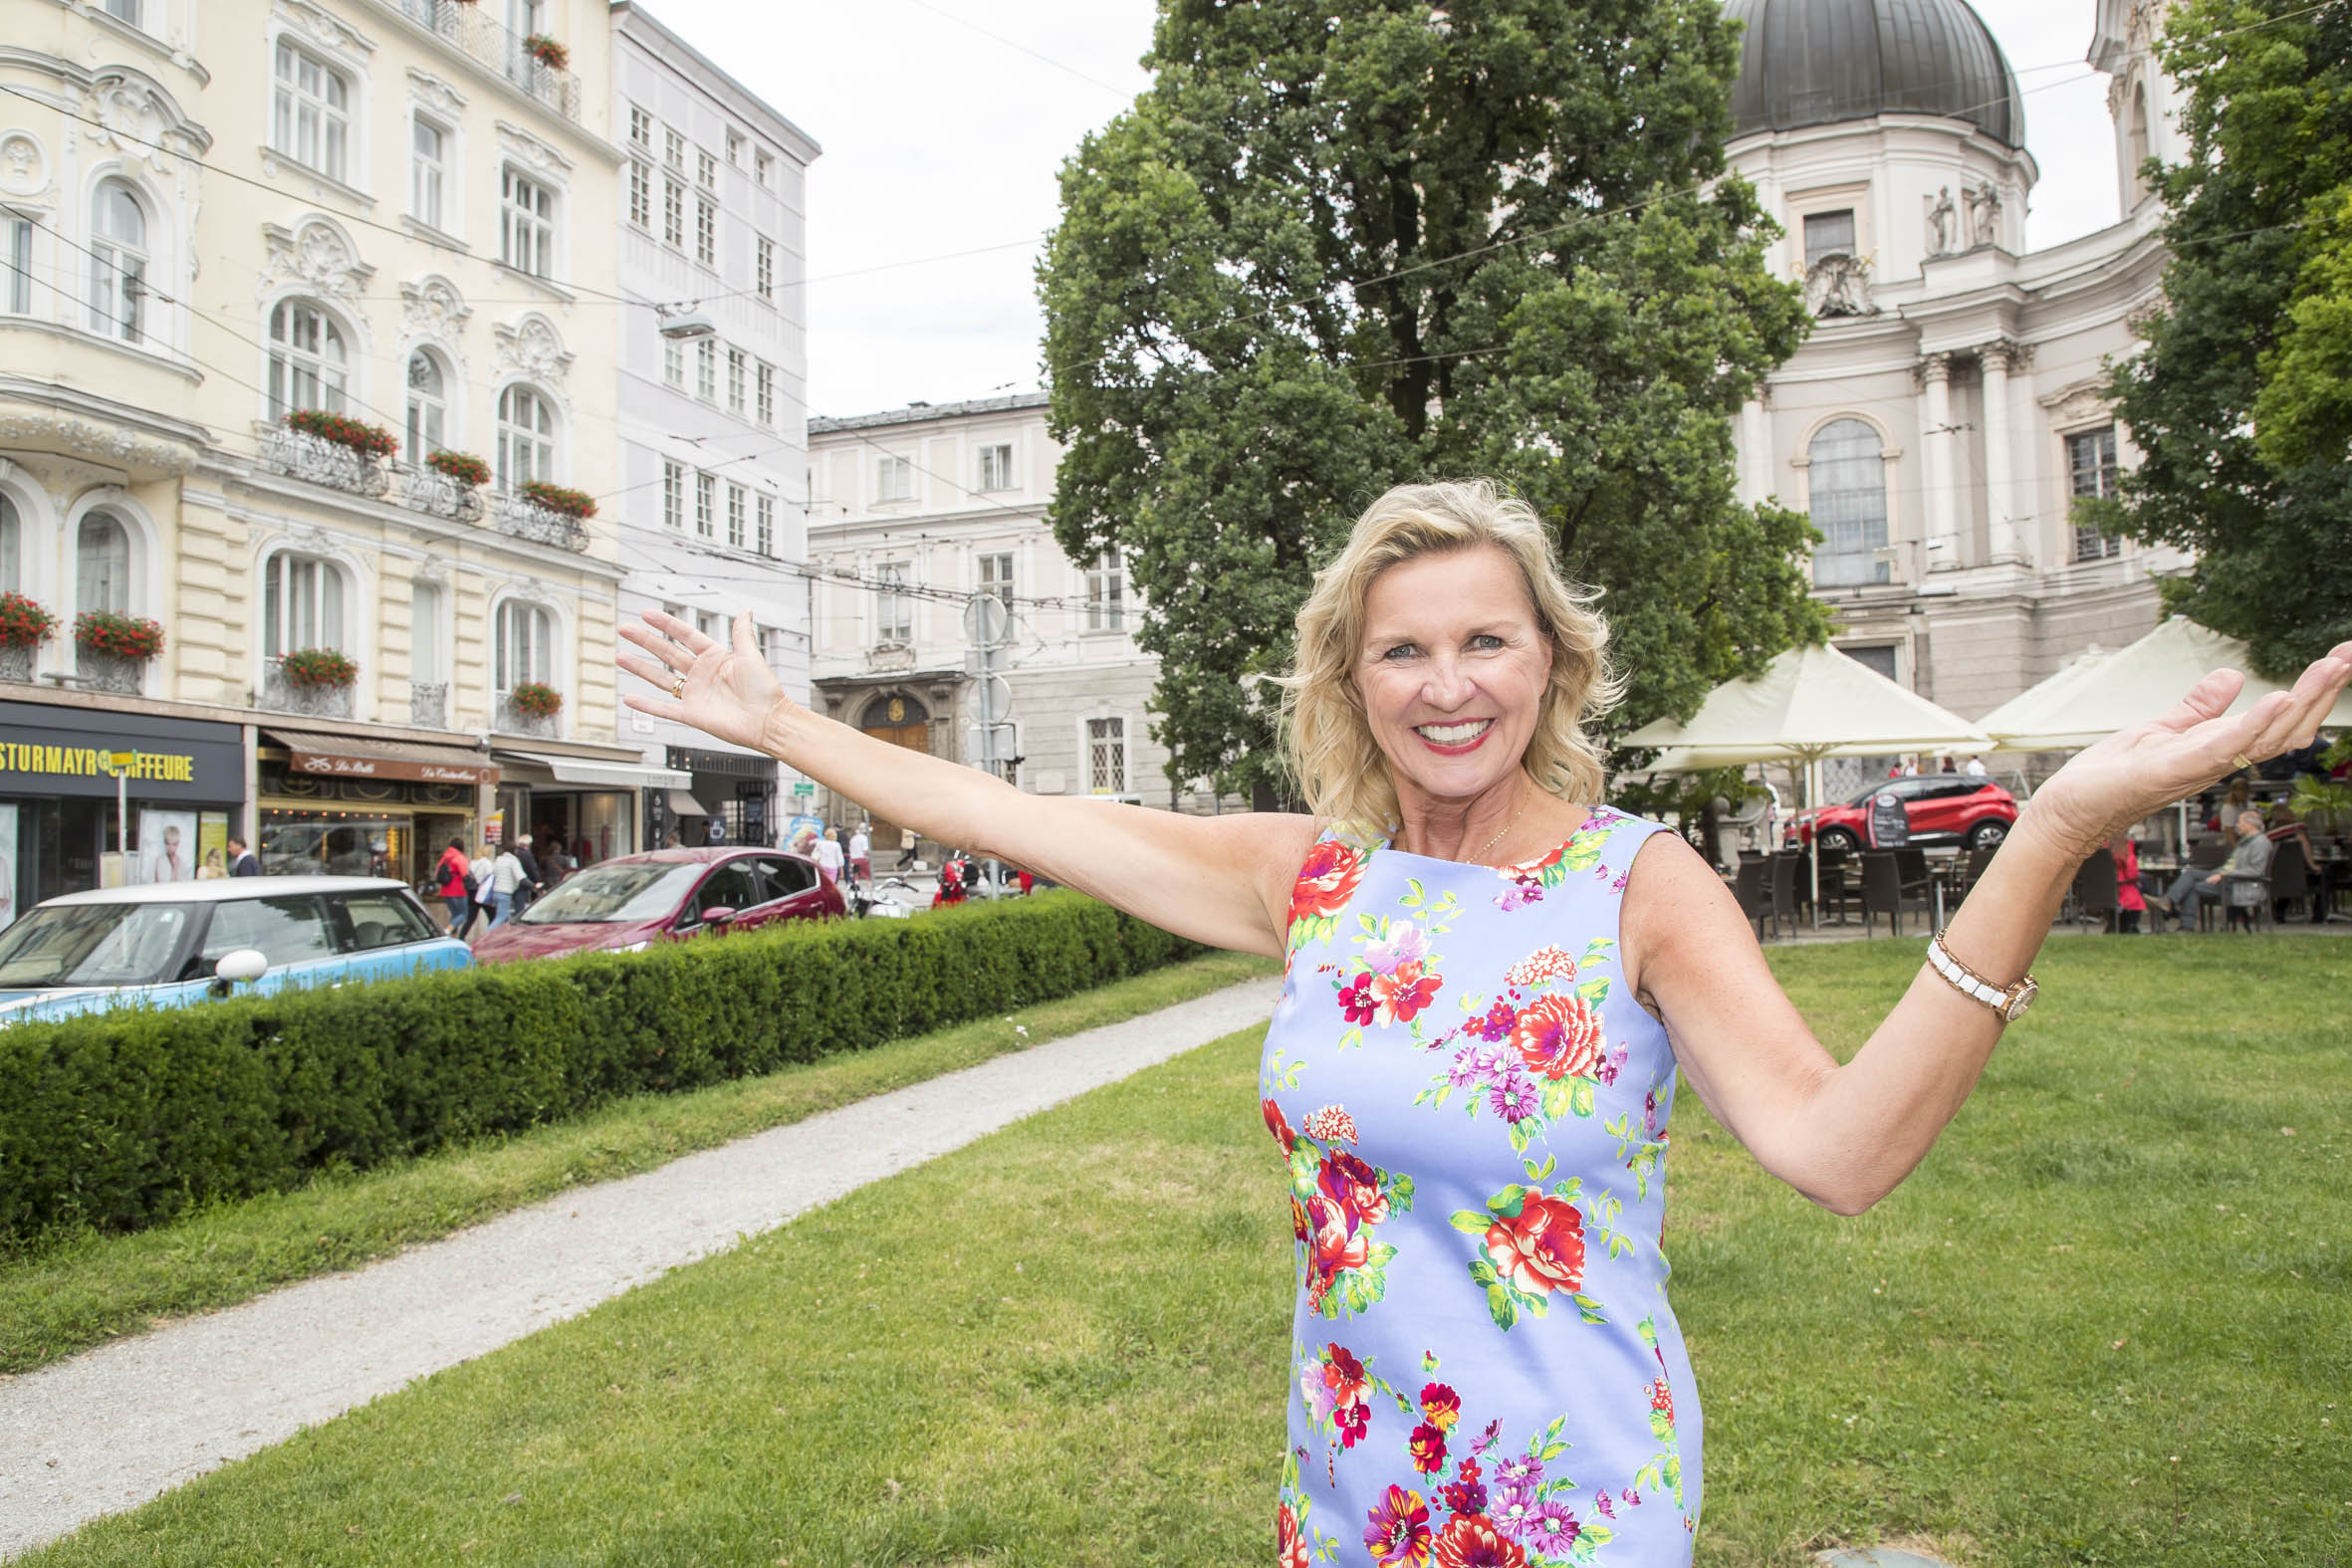 Shoppingtour Hera Lind